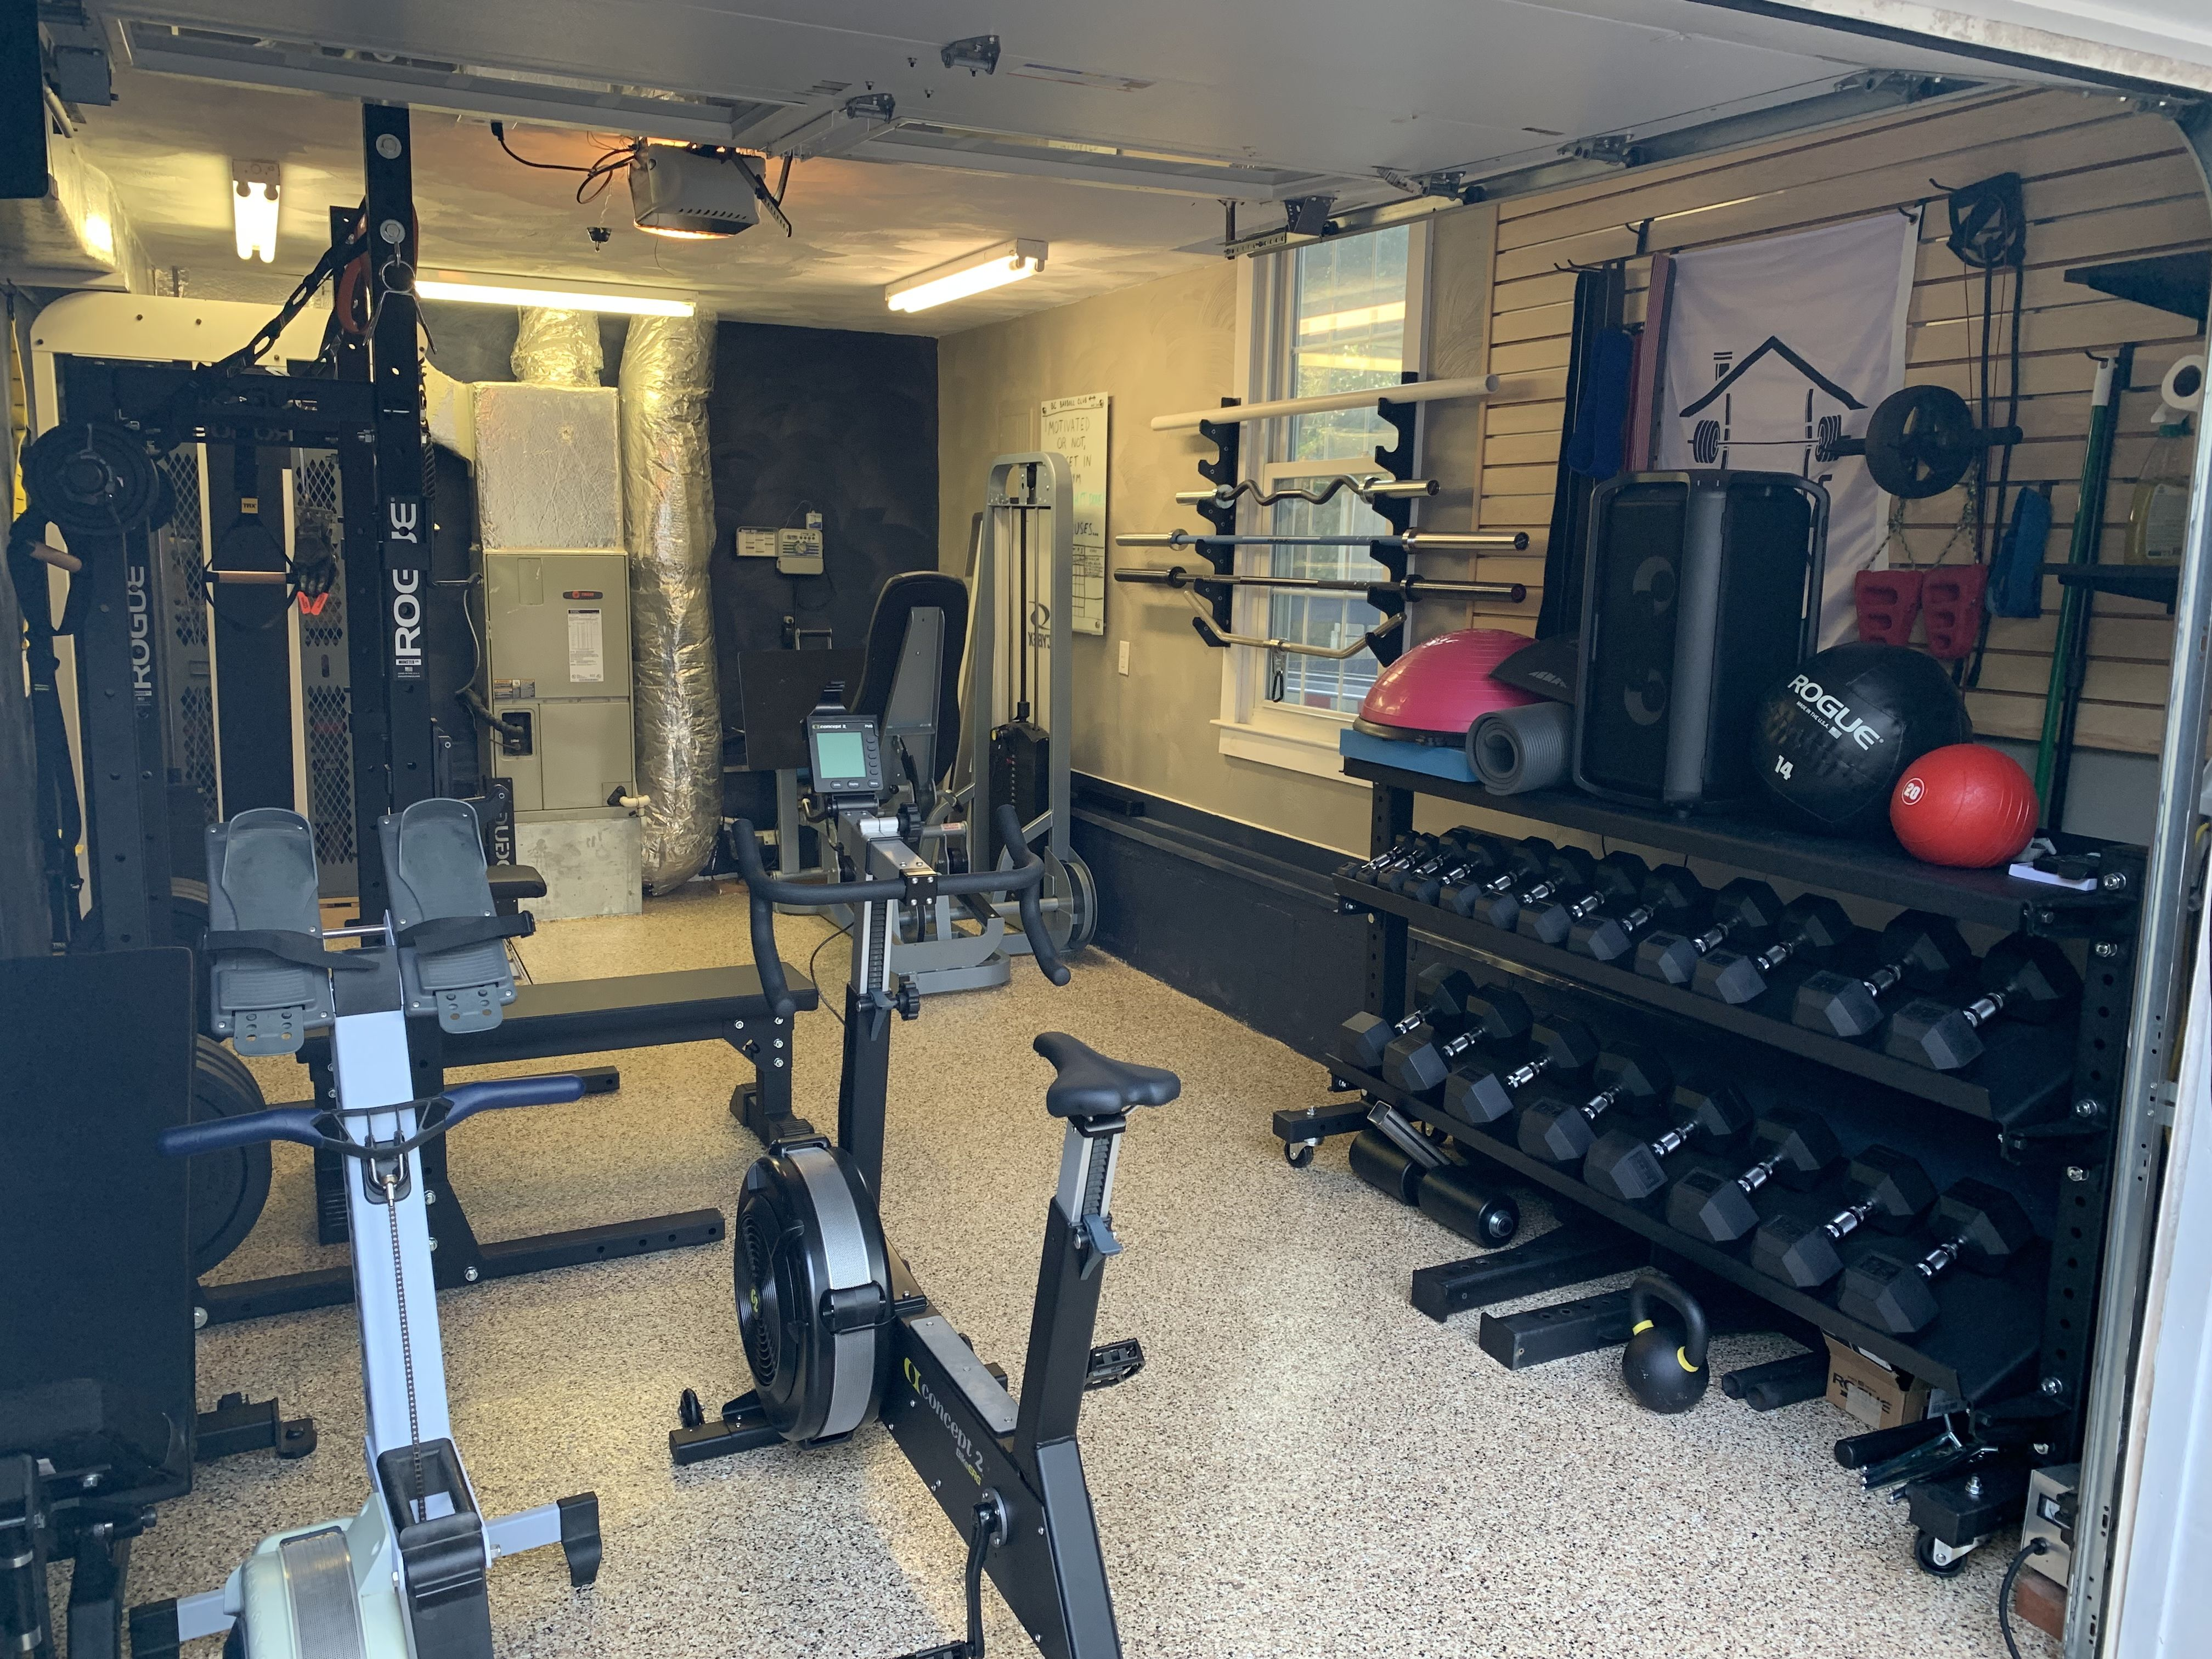 1 Car Garage Gym Gym Room At Home Home Gym Garage Garage Gym